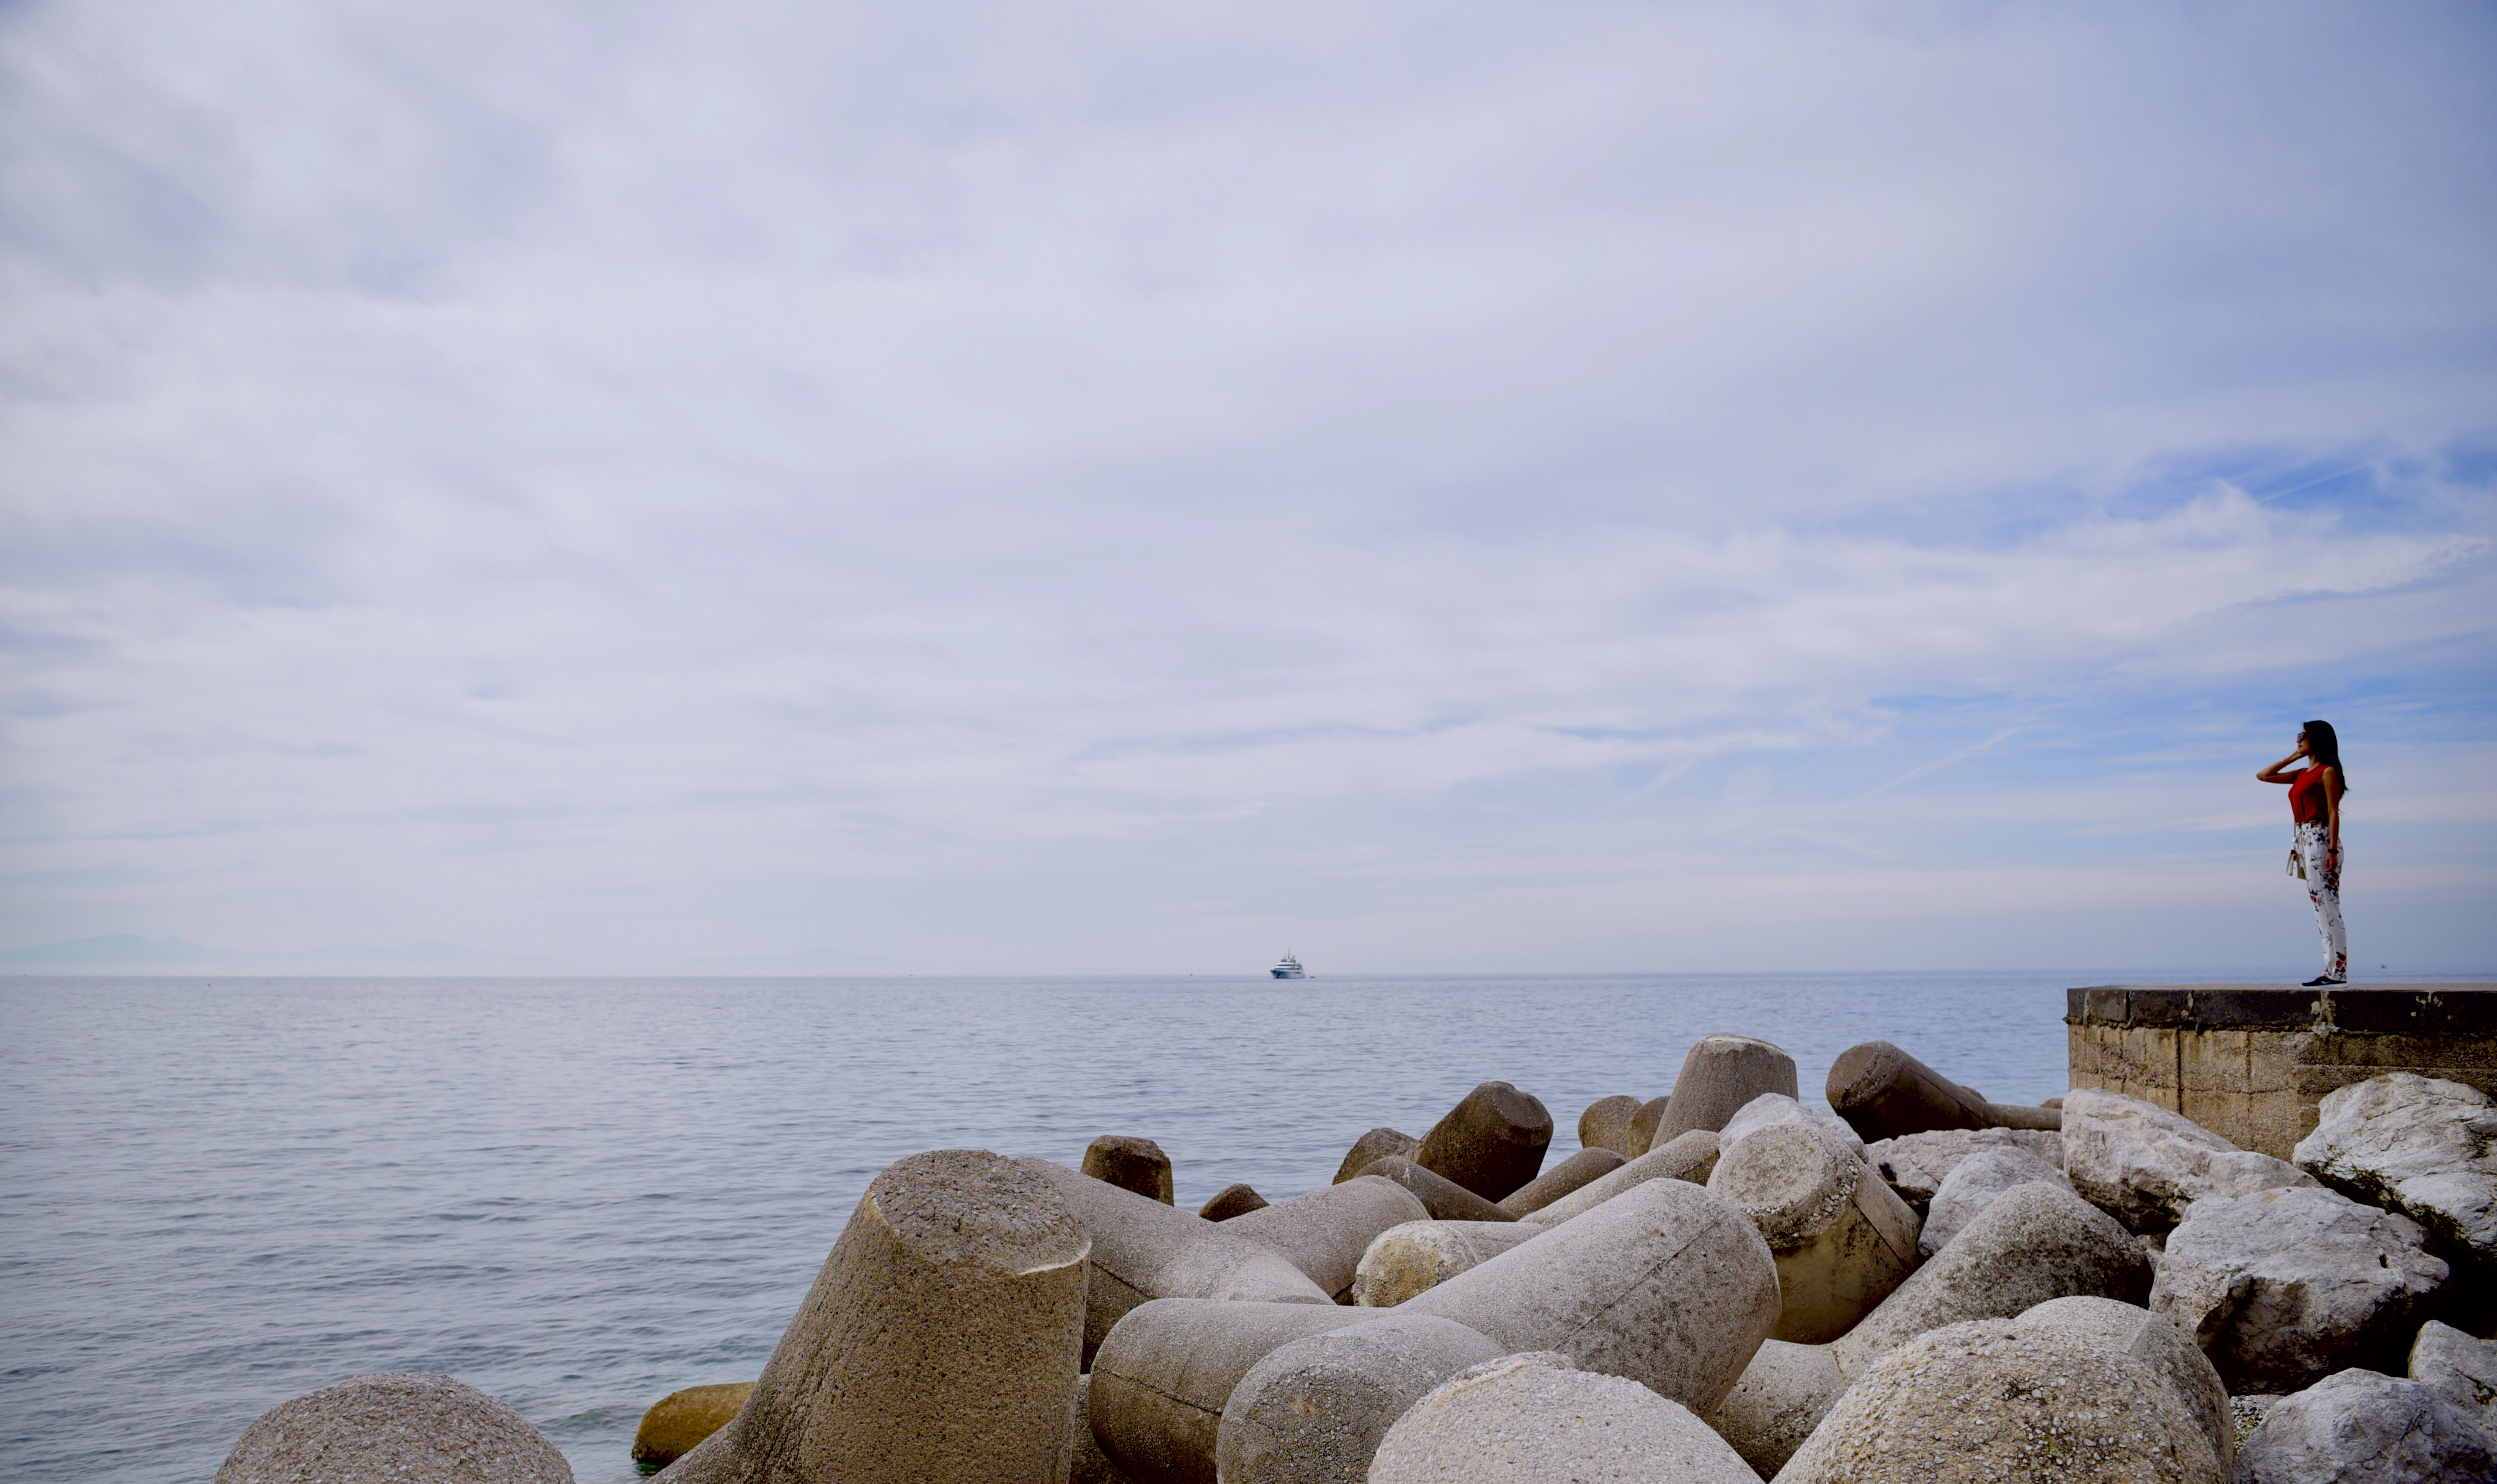 Amalfi Marina Boat Infinite Coast Dock DNXB dongnanxibei